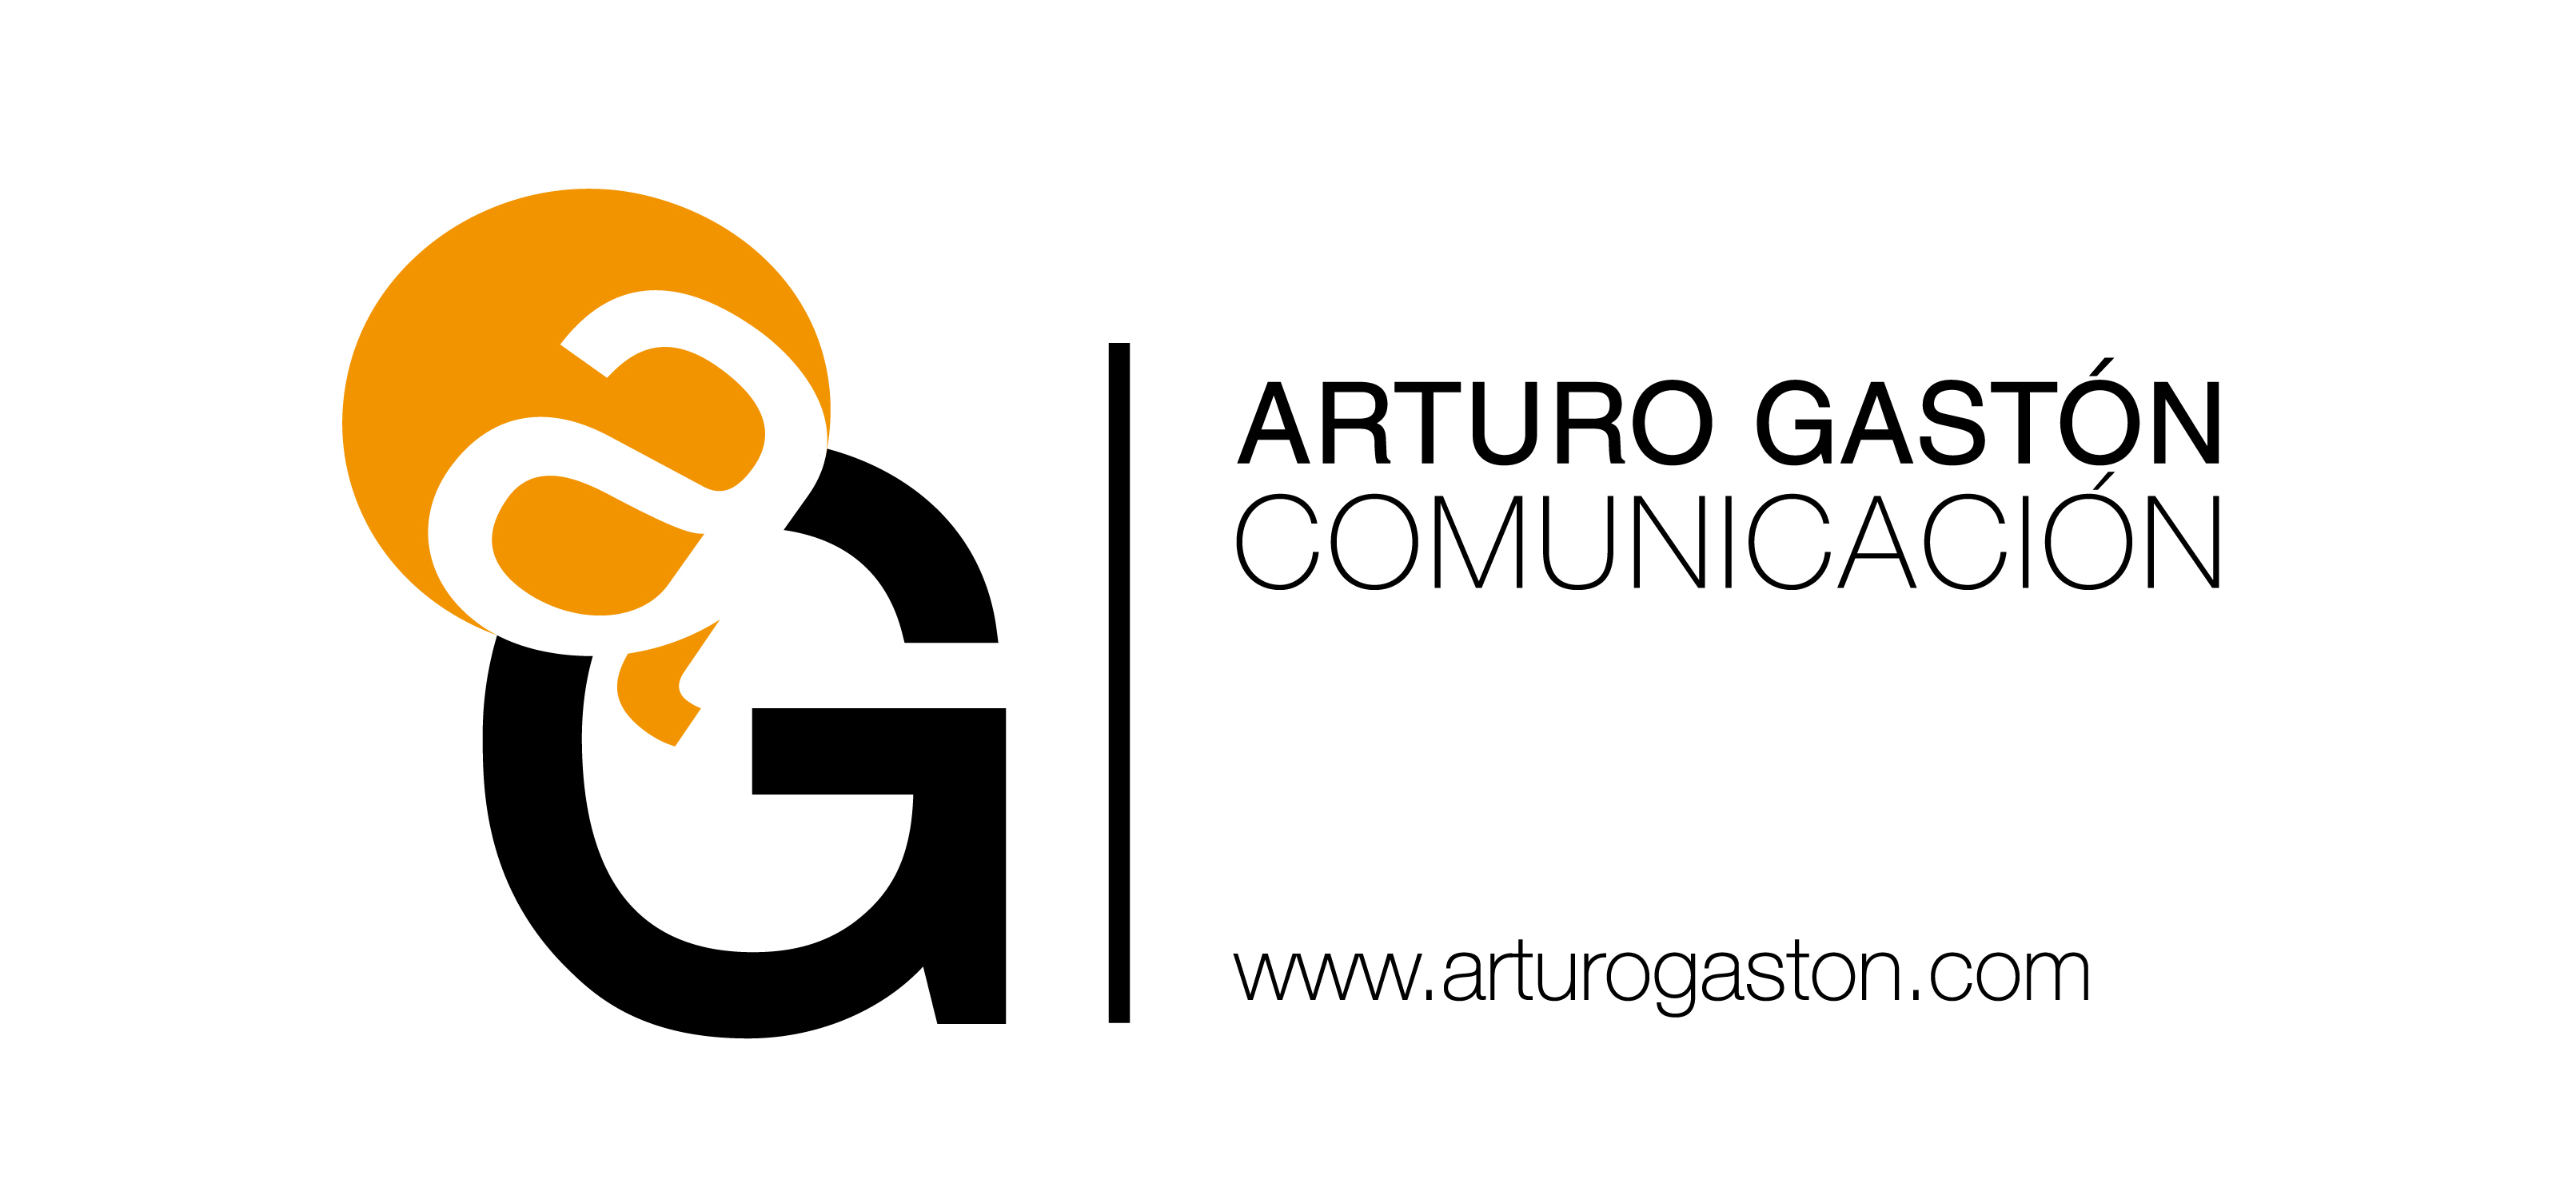 Arturo Gastón Comunicación